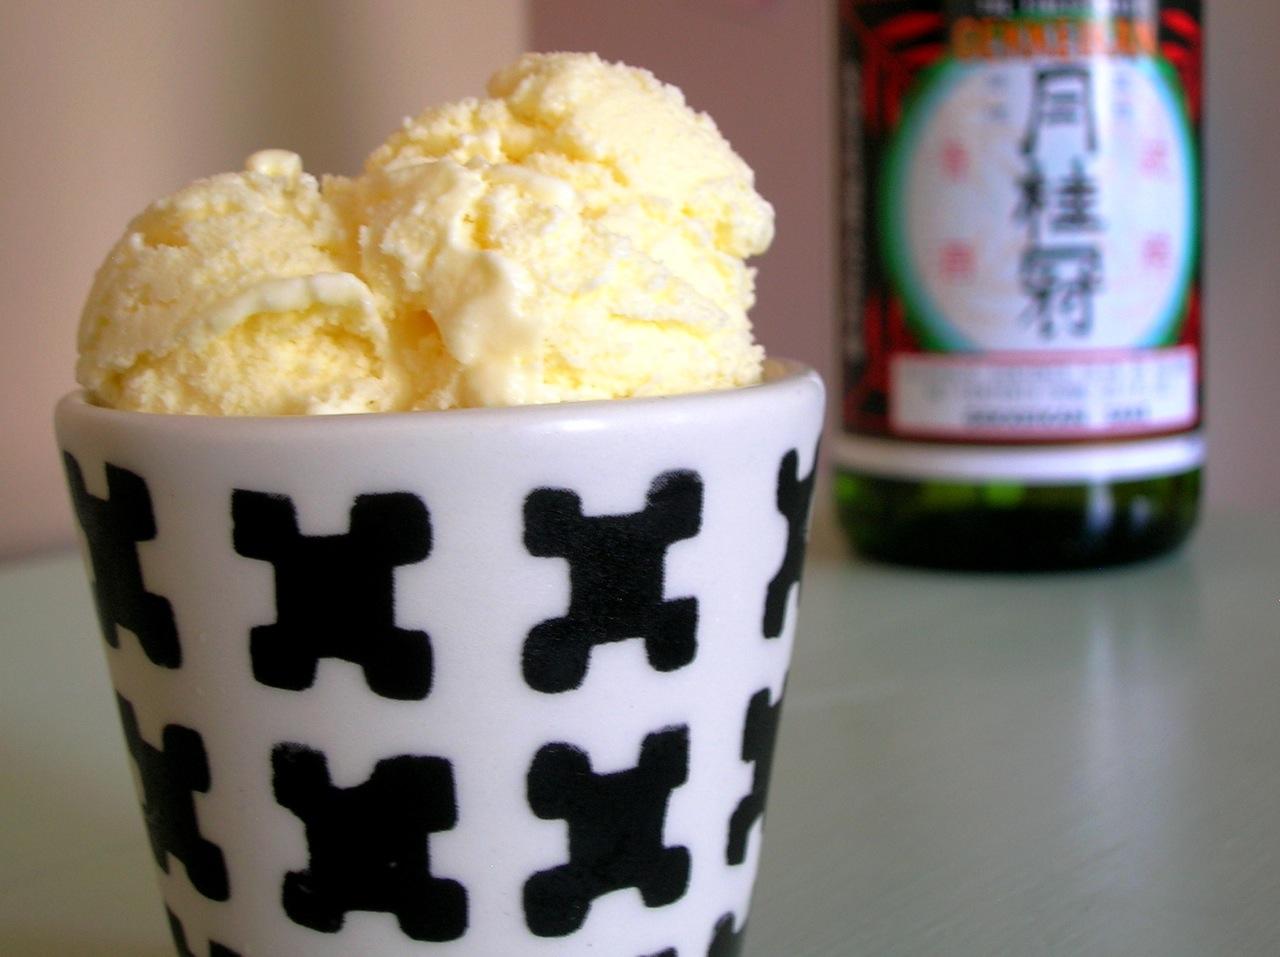 Ginger Sake Ice Cream | The Frozen Fix: Ice cream, sorbet, and frozen ...